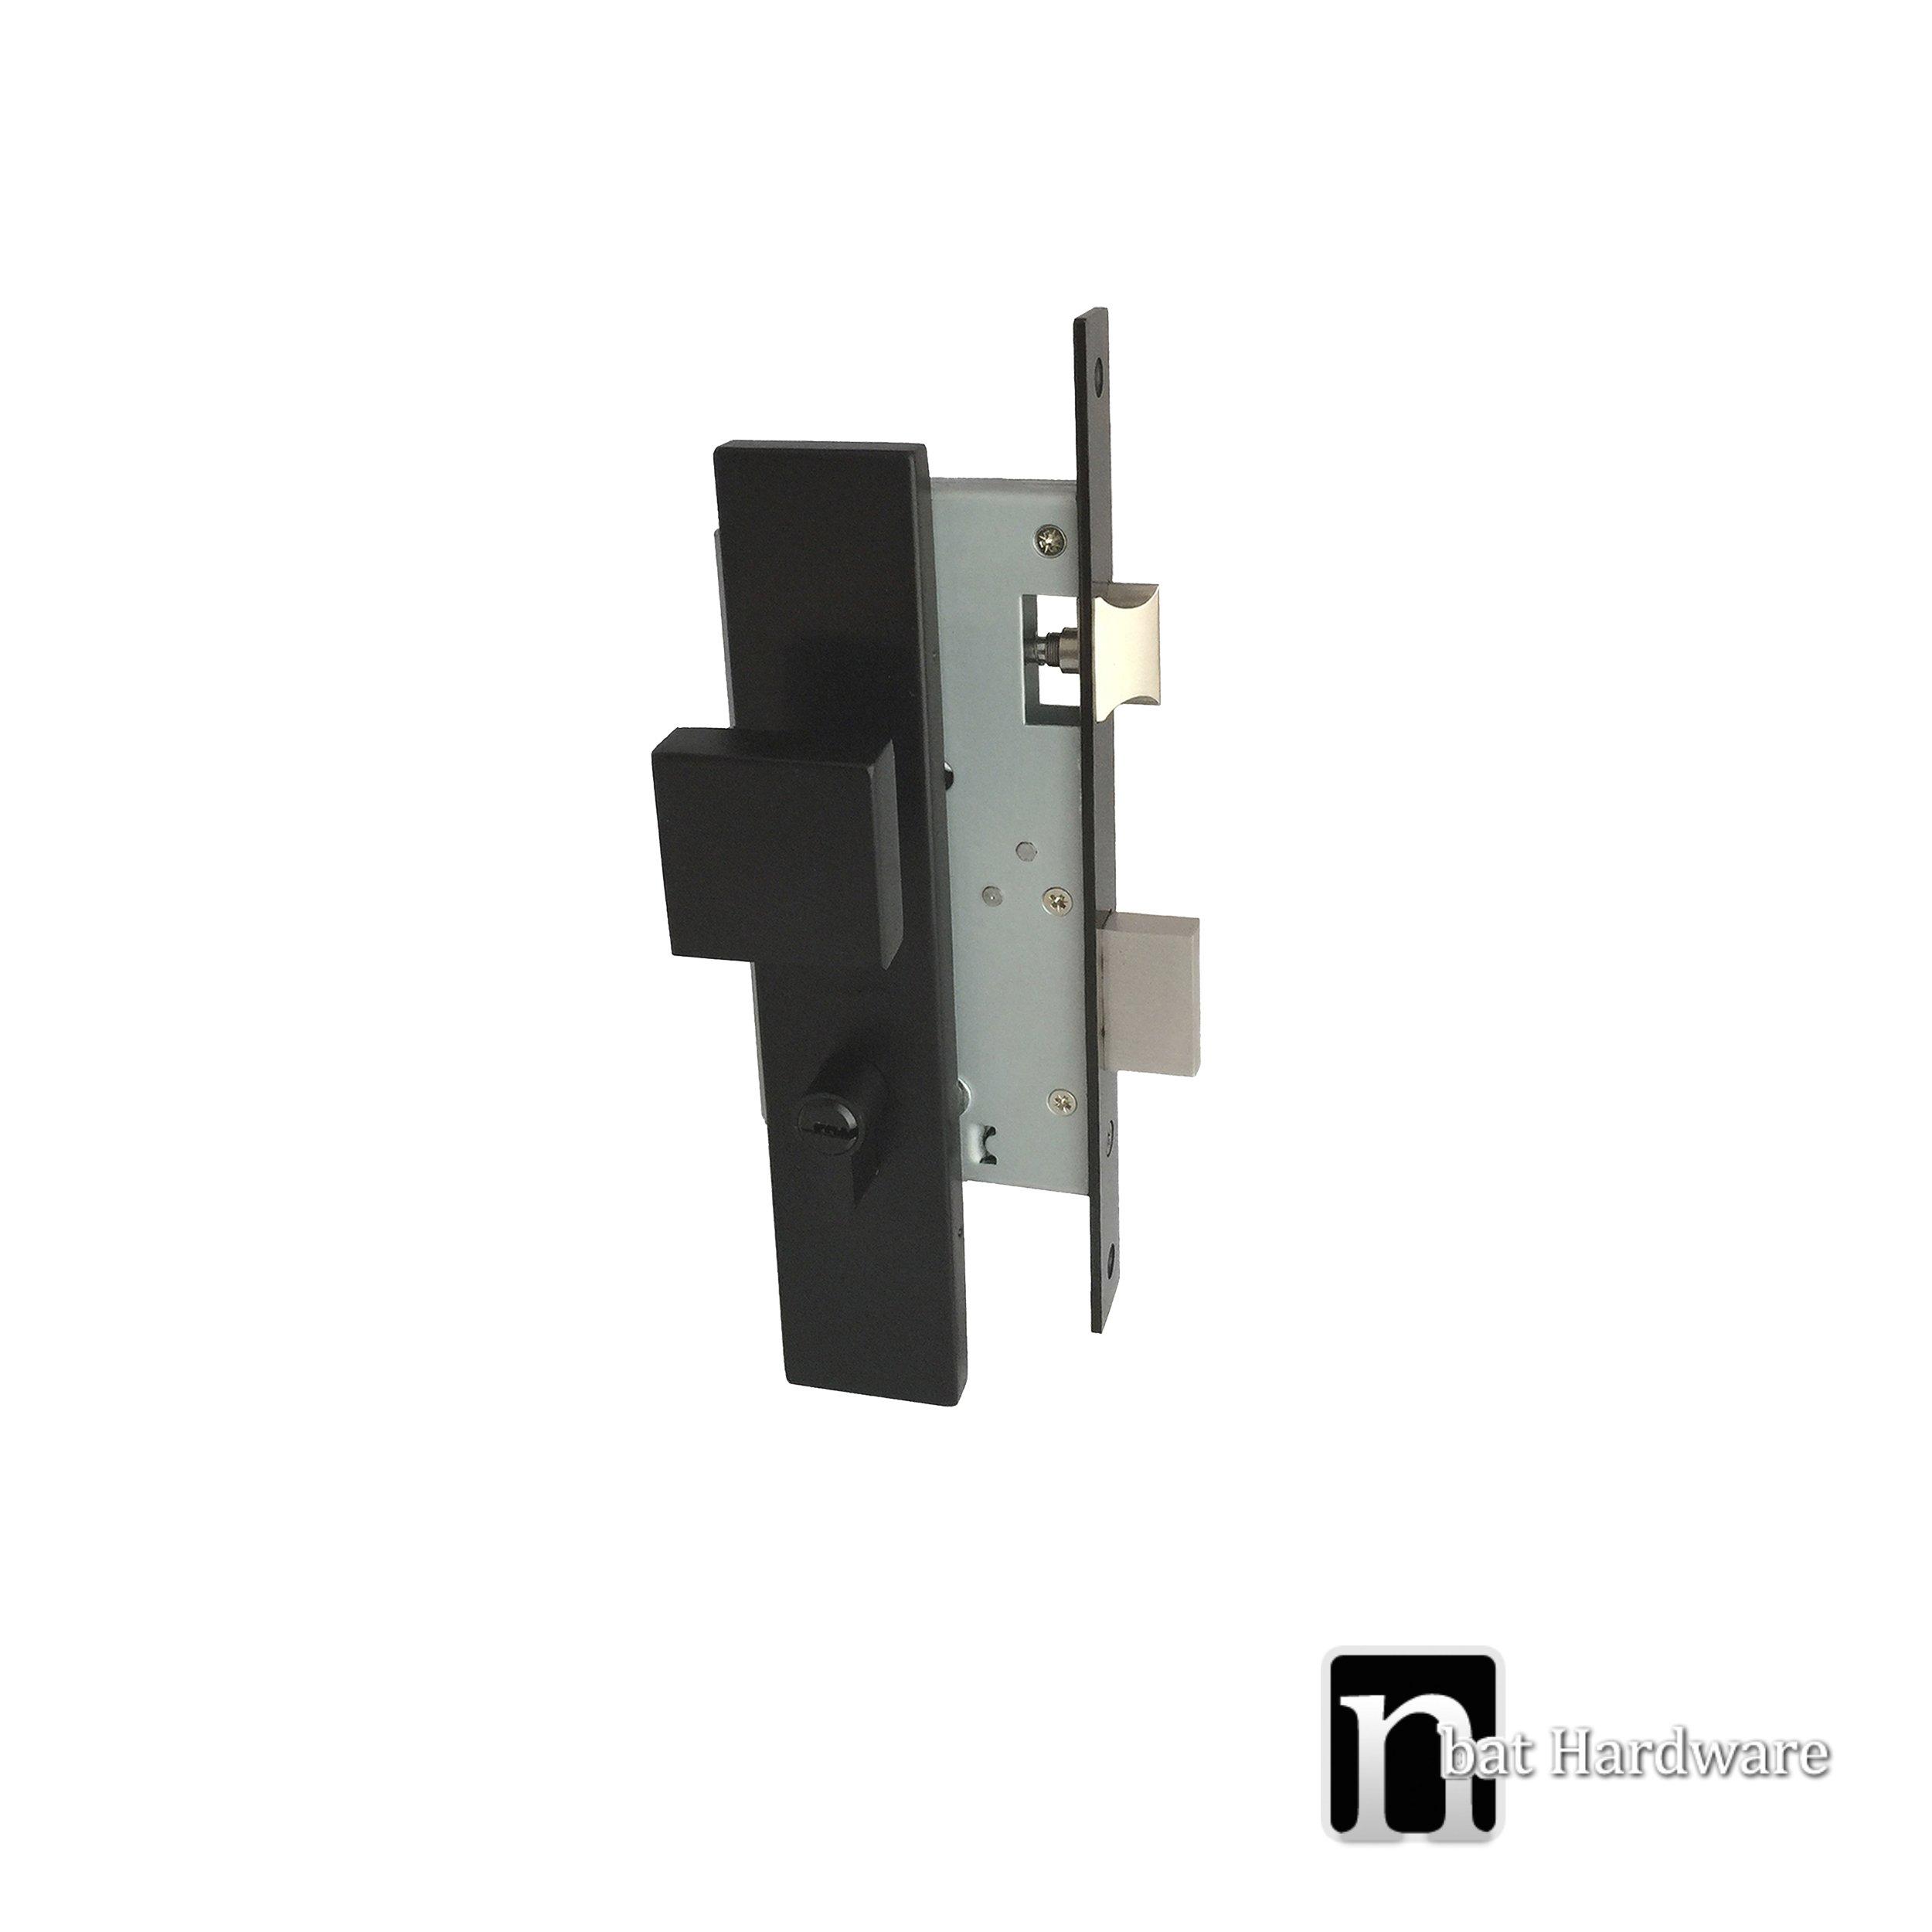 Black Entrance Mortice Lock With Square Knob Nbat Hardware